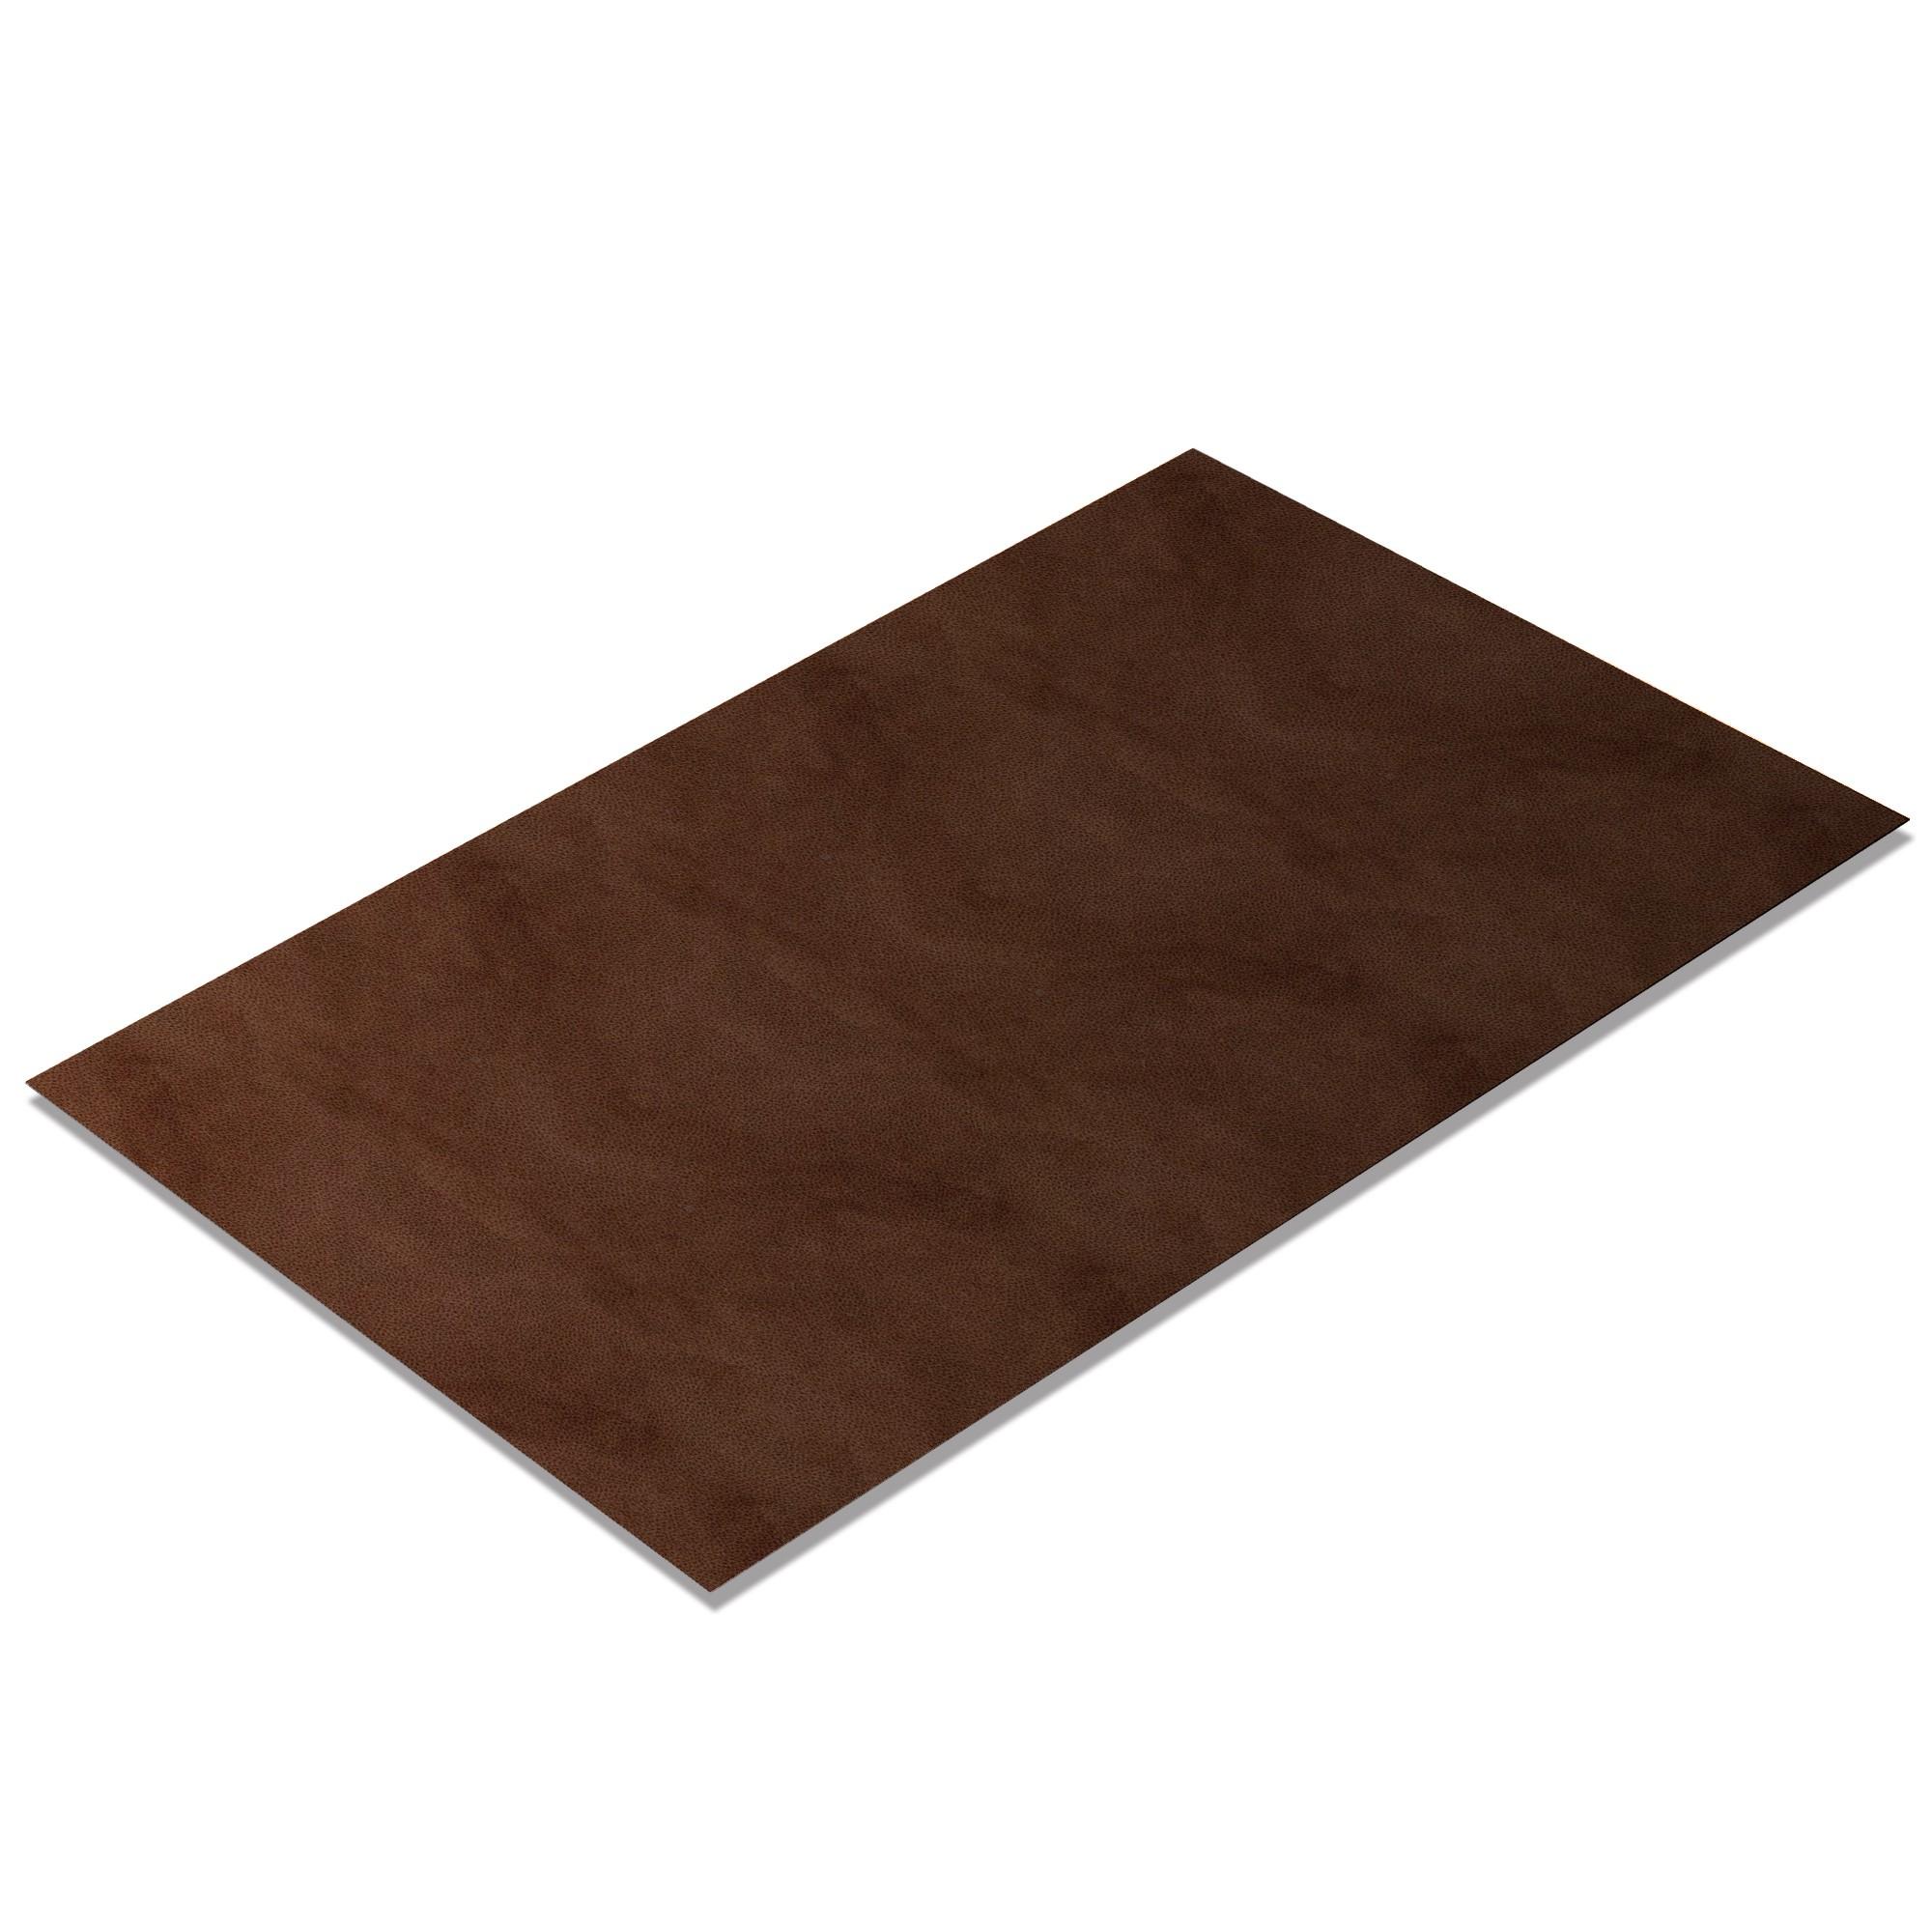 Kunstleder Meterware Nevada-Soft Dark-Brown [NEVSO805]